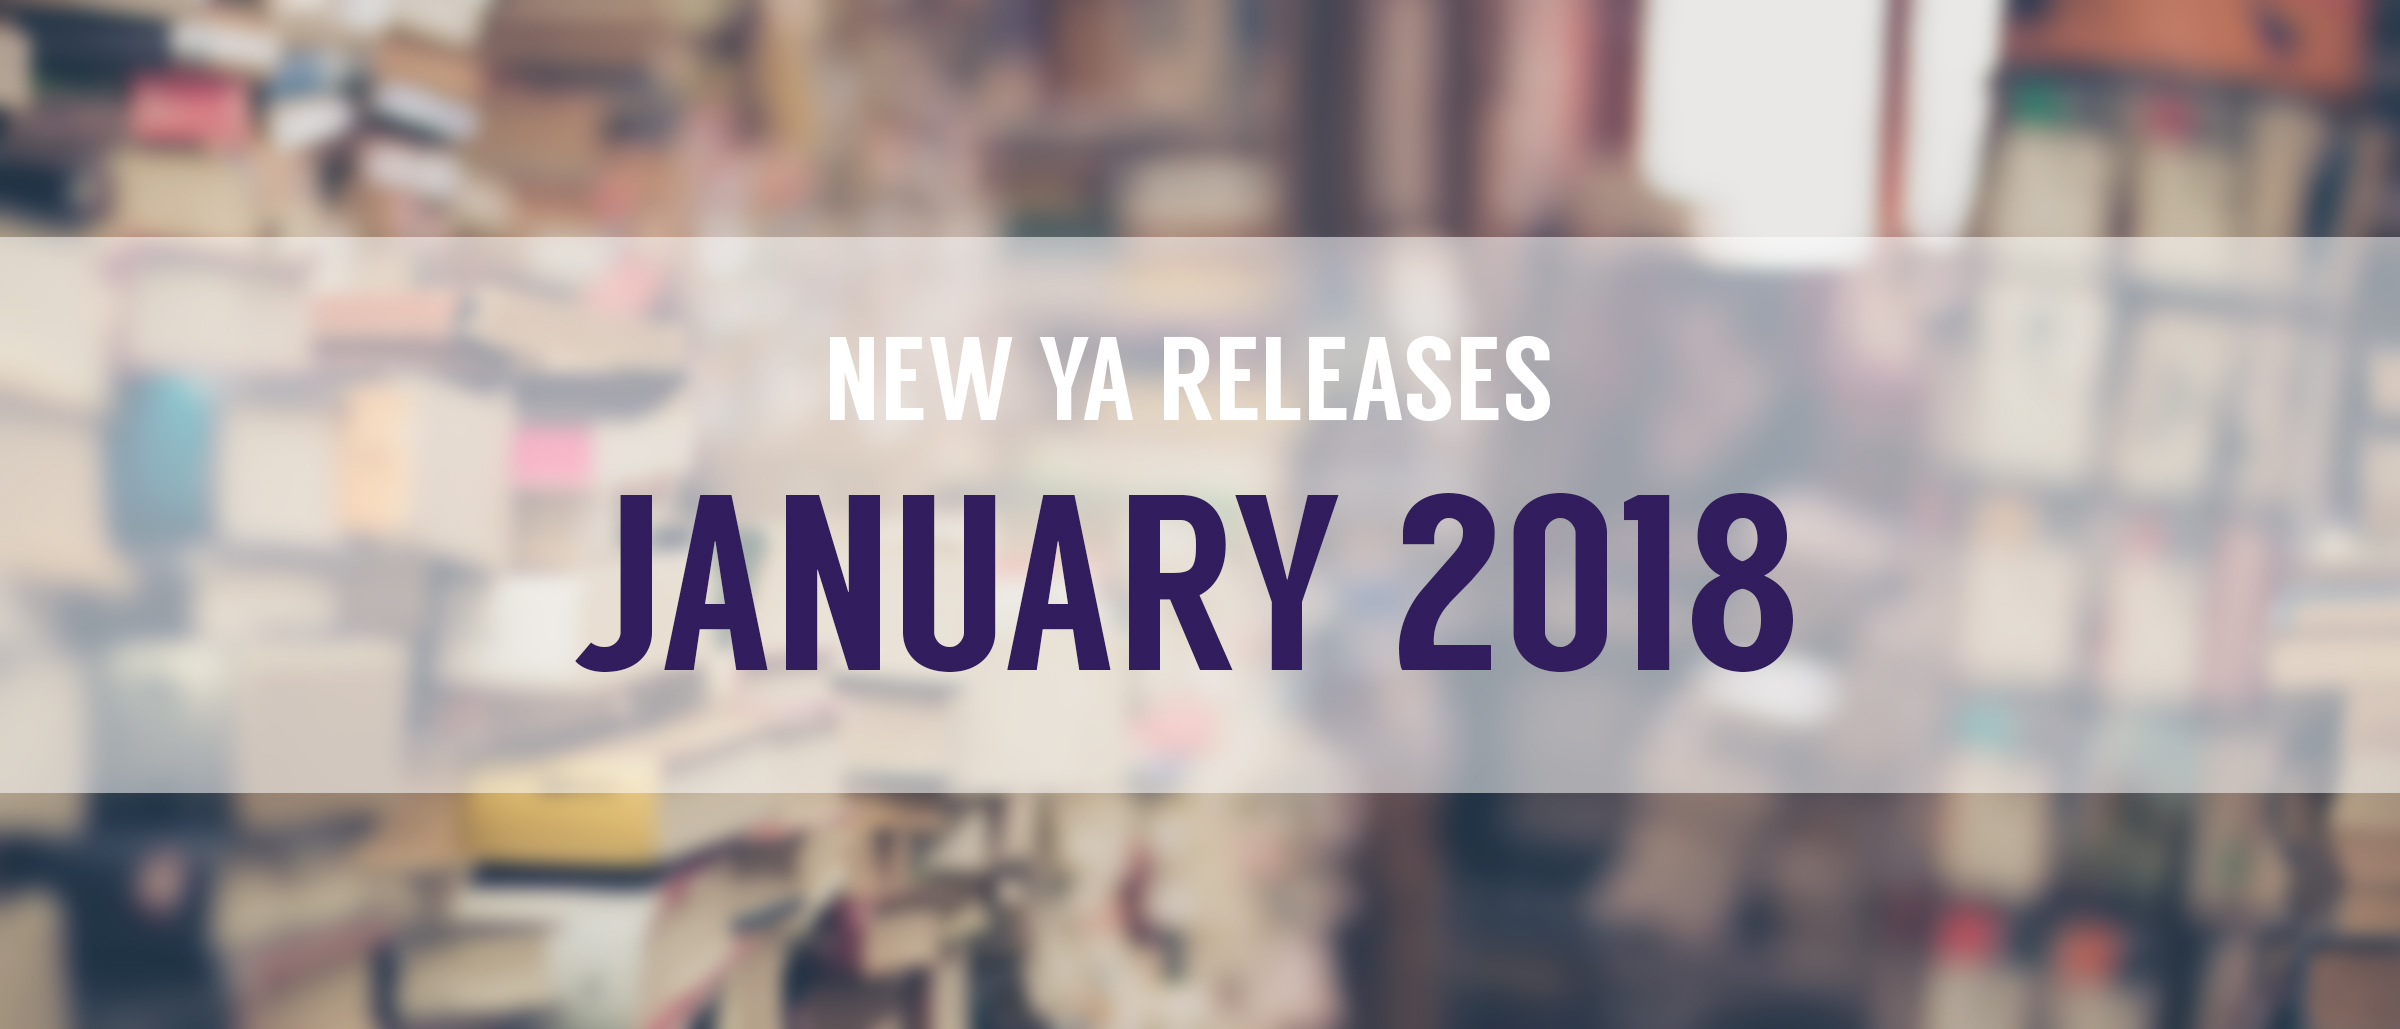 new ya books, jnauary ya books, january book releases, new young adult books, new books 2018, new books january, upcoming book releases, new fantasy books, new fiction books, new sci-fi books,